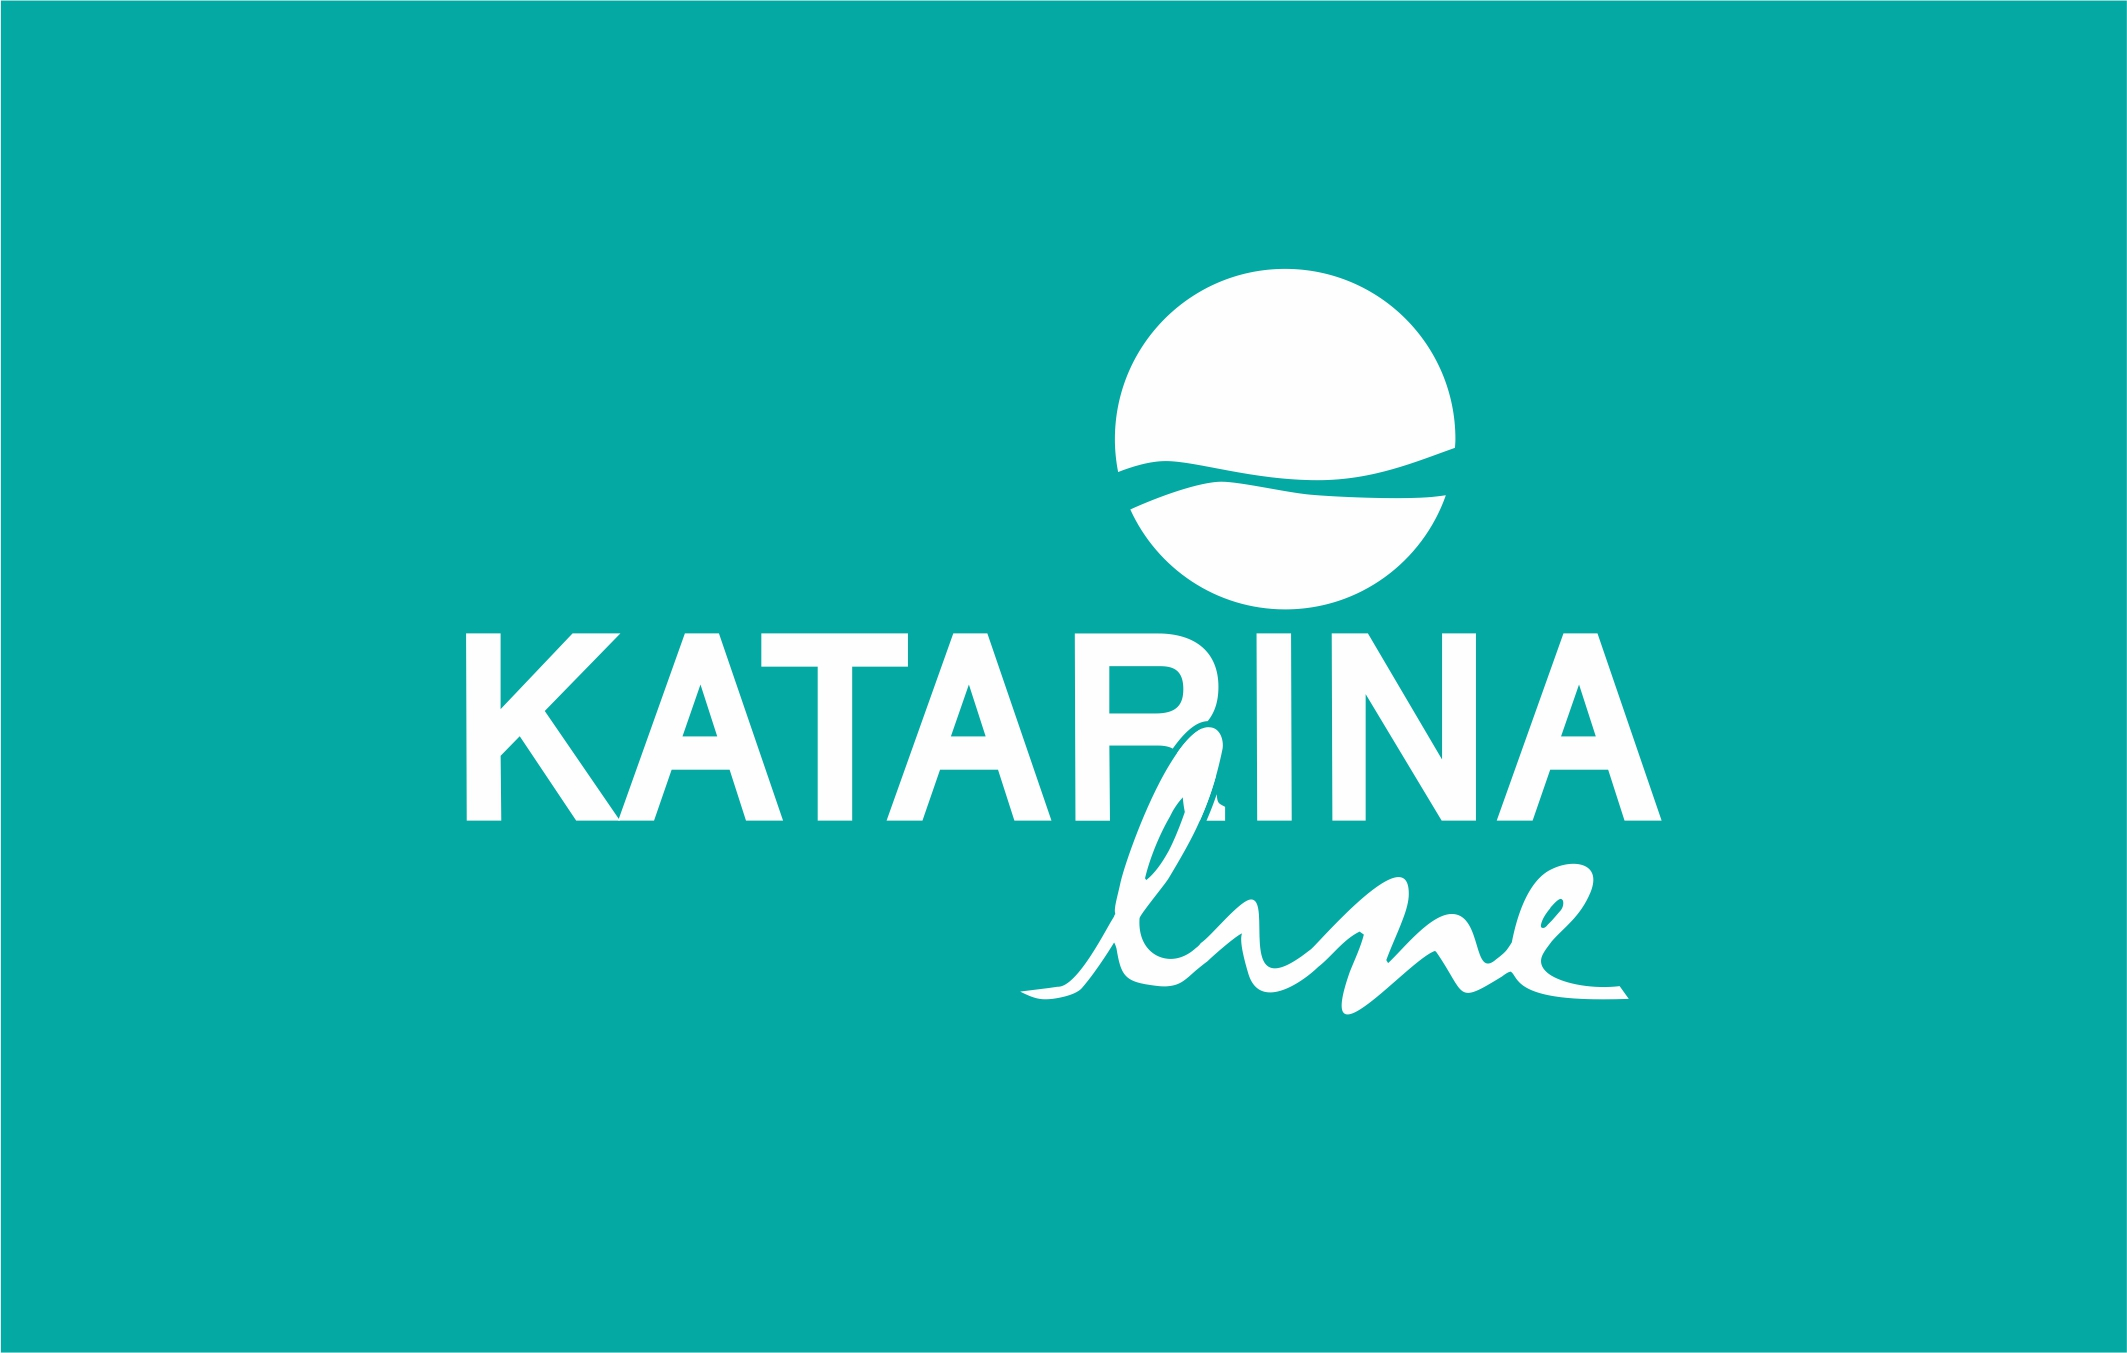 Katarina_Line_030917.jpg